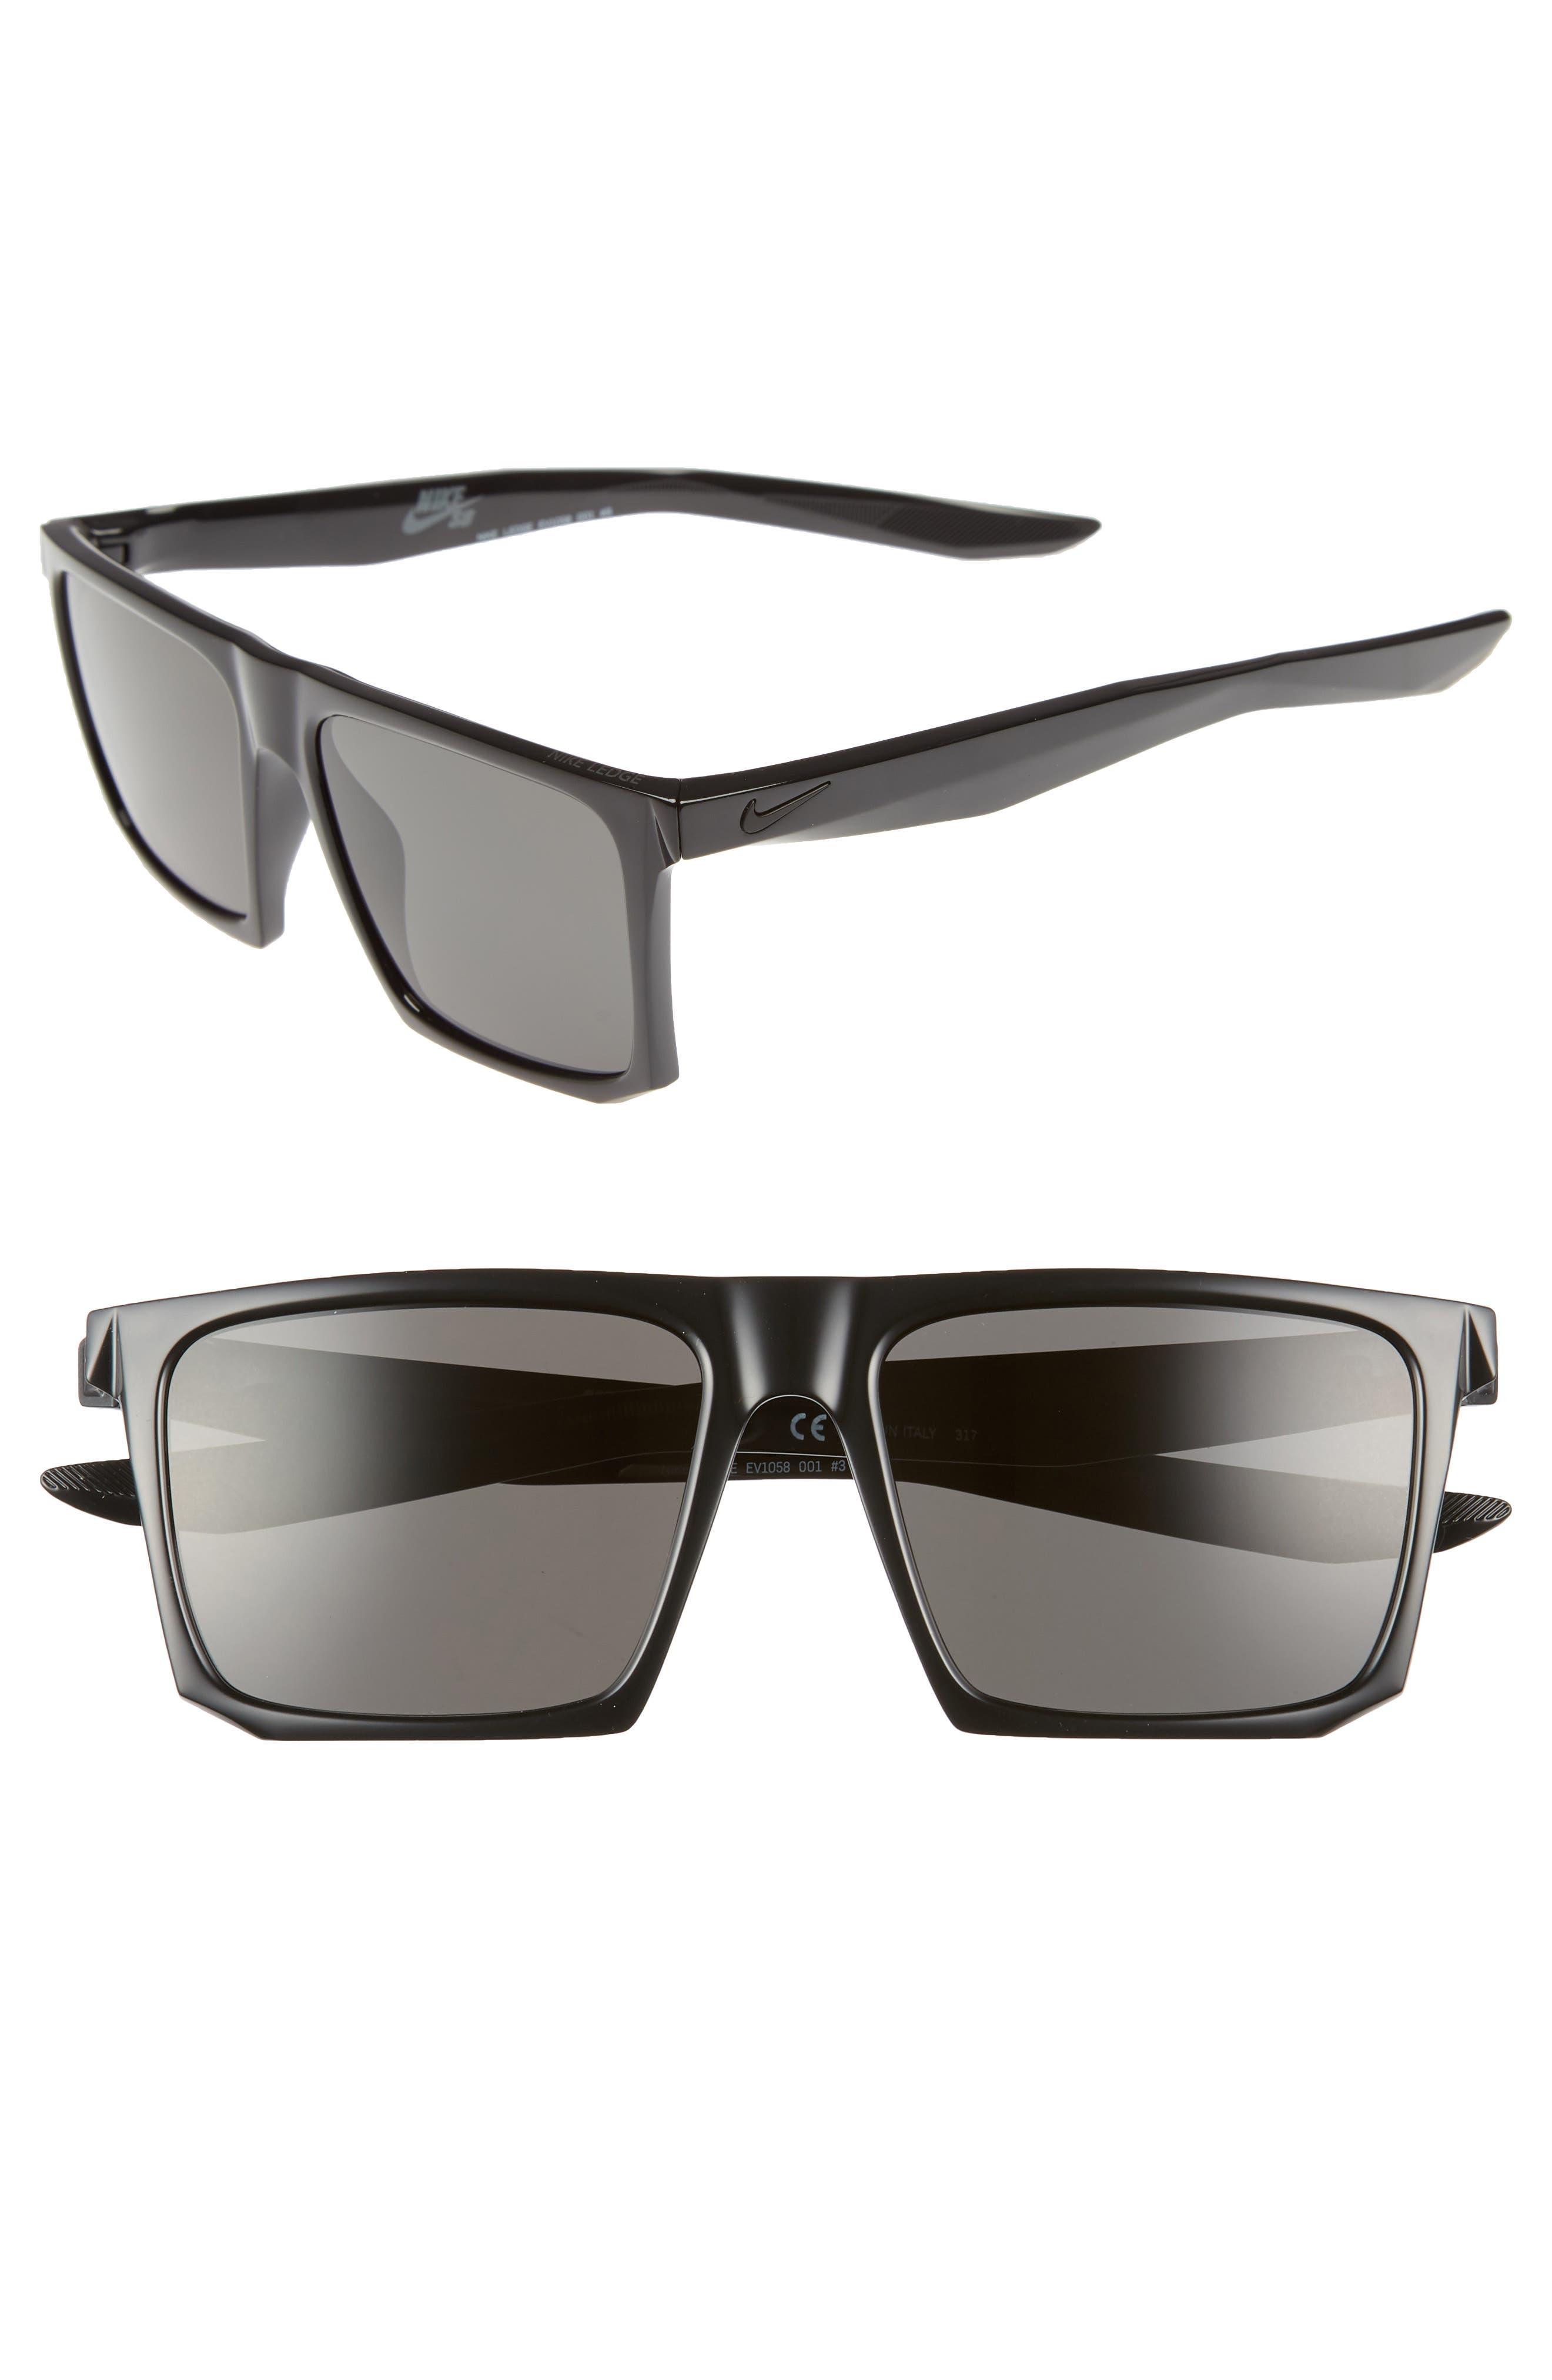 Ledge 56mm Sunglasses,                         Main,                         color, BLACK/ DARK GREY